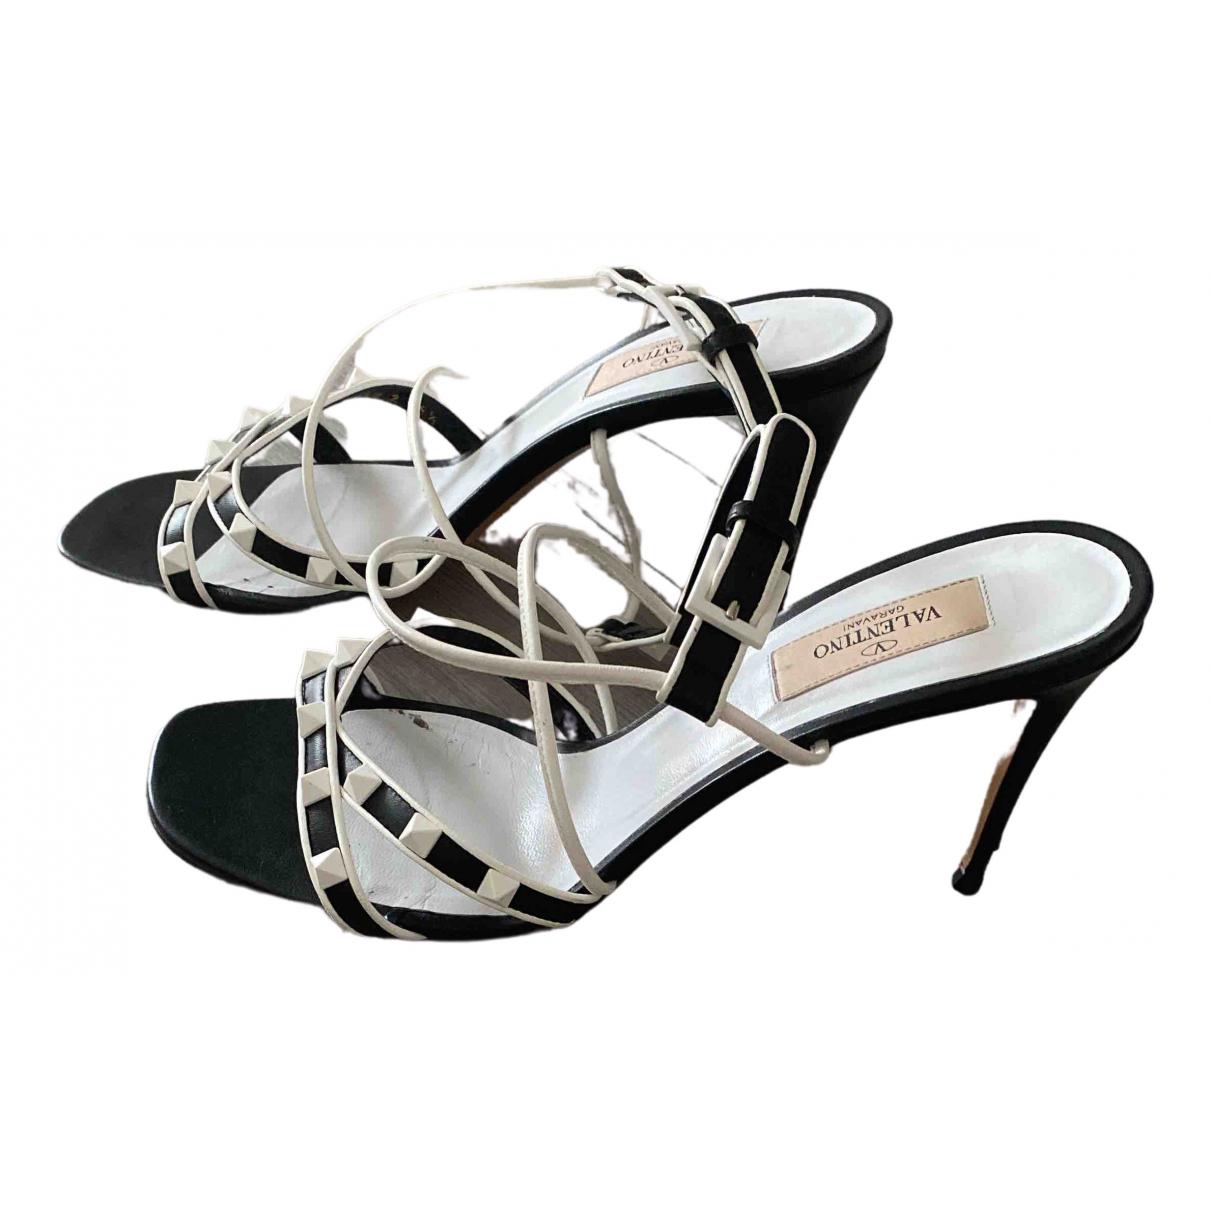 Valentino Garavani Rockstud Black Leather Sandals for Women 39.5 EU